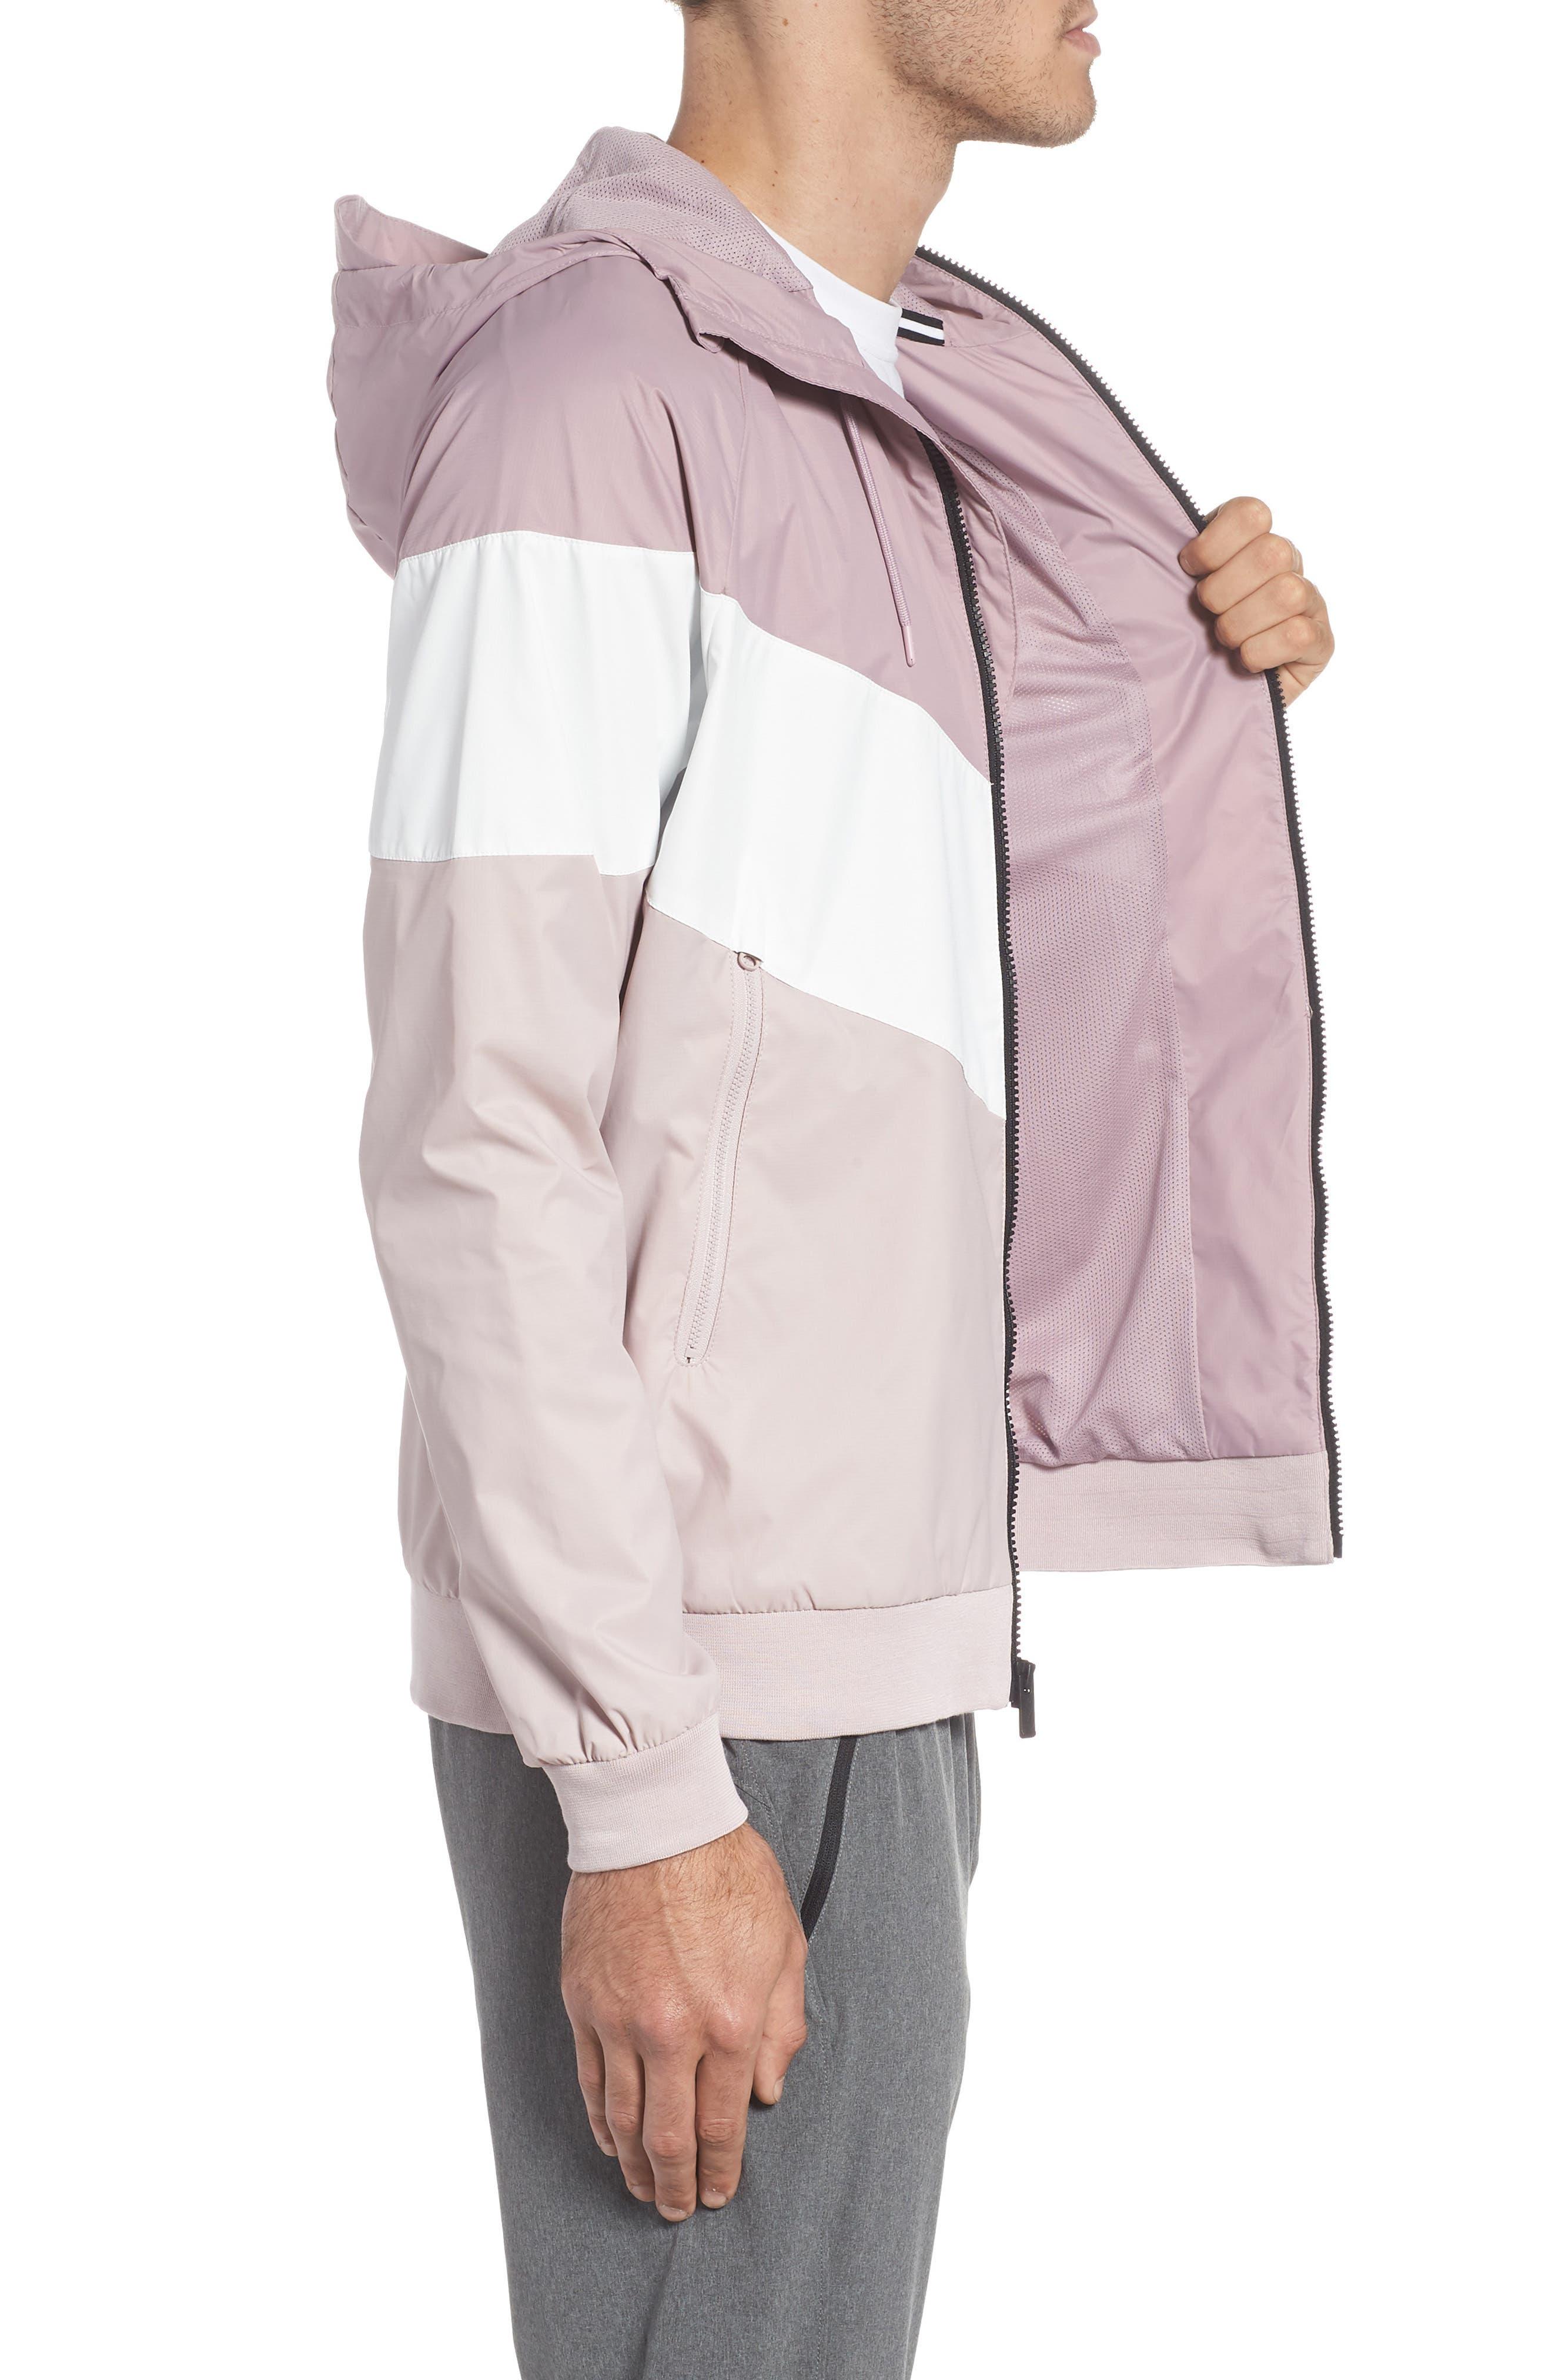 Windrunner Wind & Water Repellent Hooded Jacket,                             Alternate thumbnail 3, color,                             Elemental Rose/ Summit White